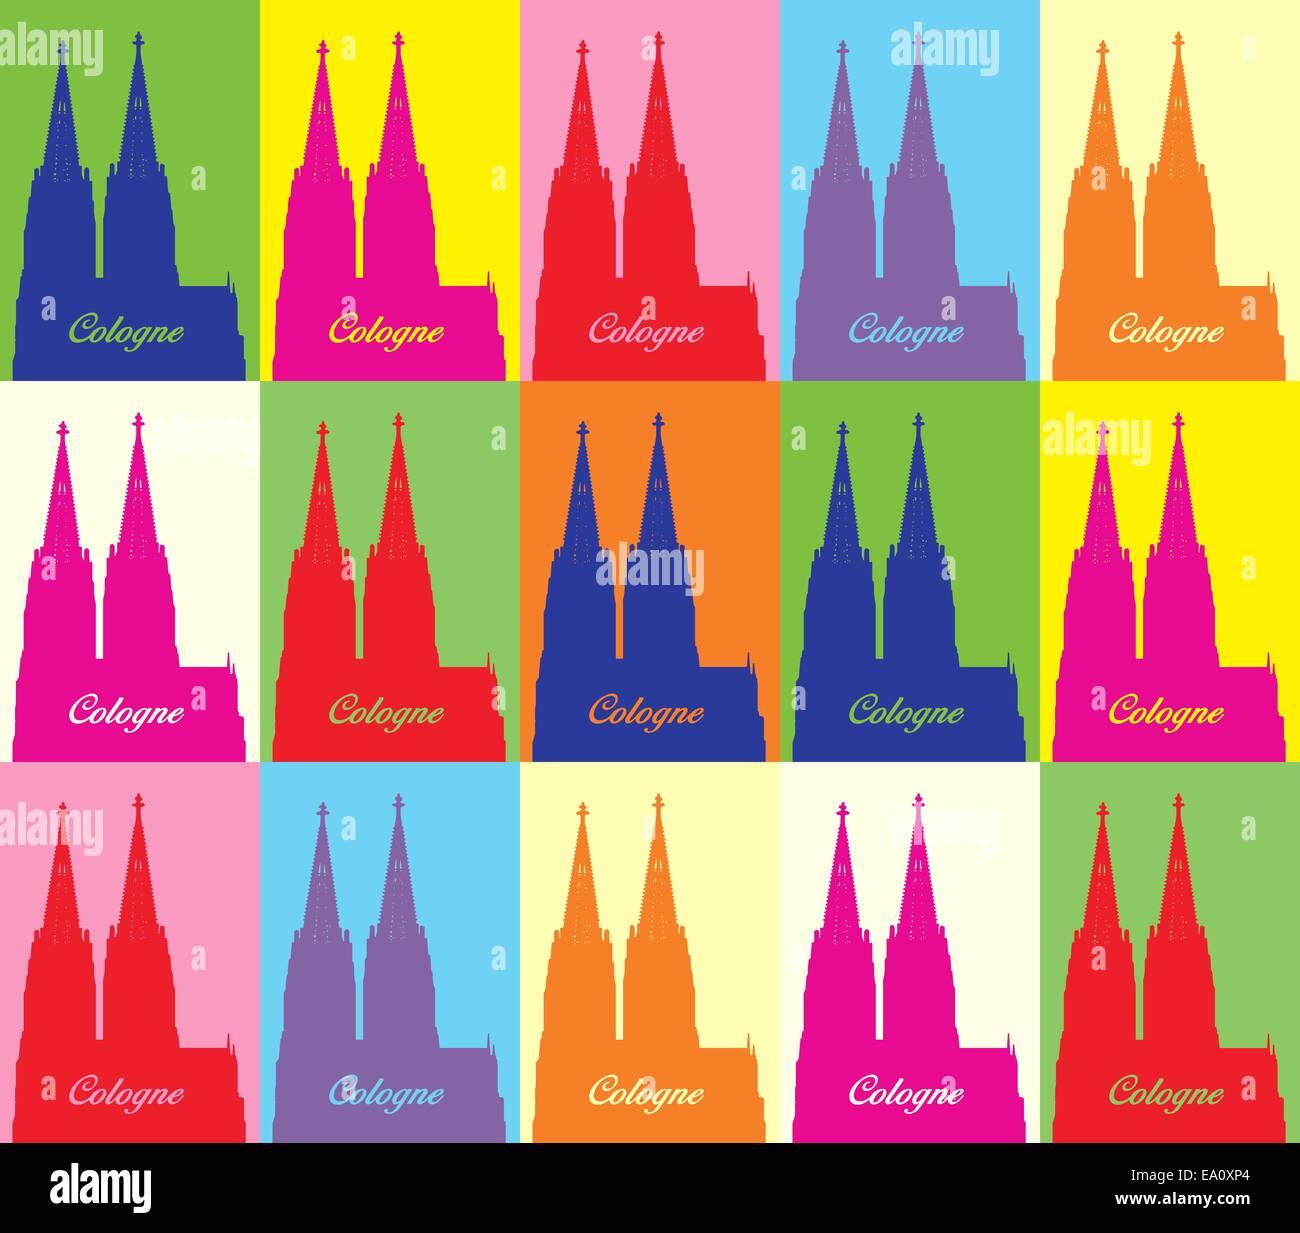 Kölner Dom Popart Stockfotos & Kölner Dom Popart Bilder - Alamy